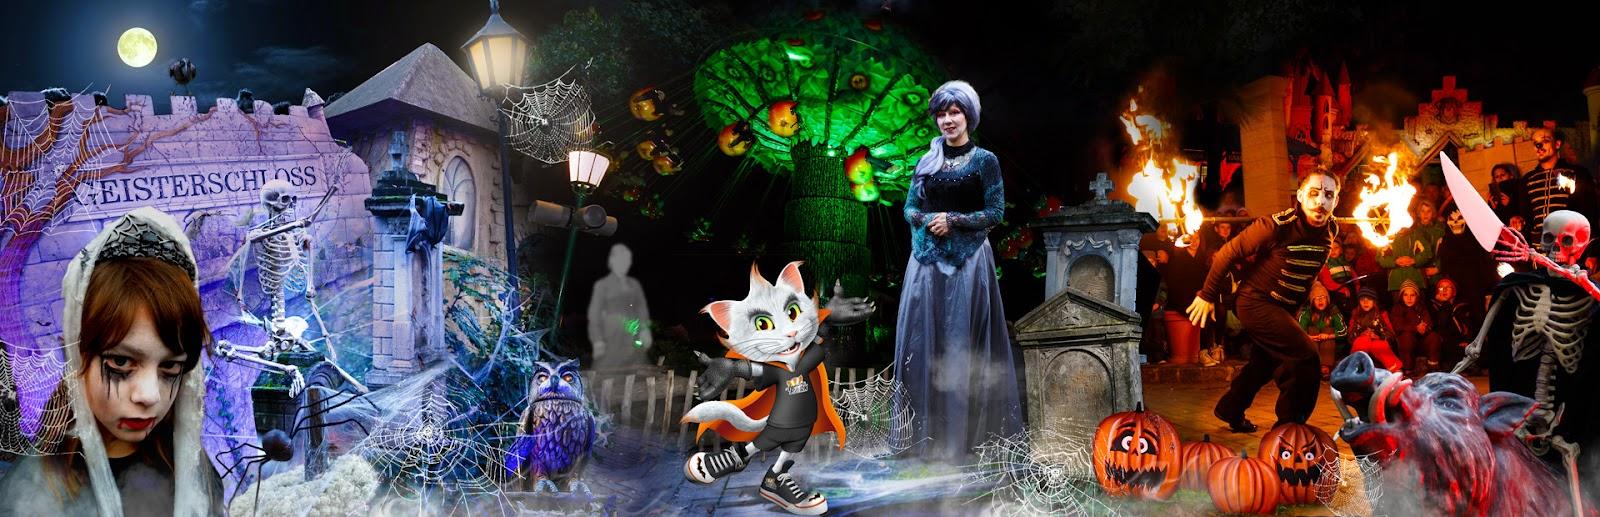 06_Halloween_1920x620px_Korr.jpg